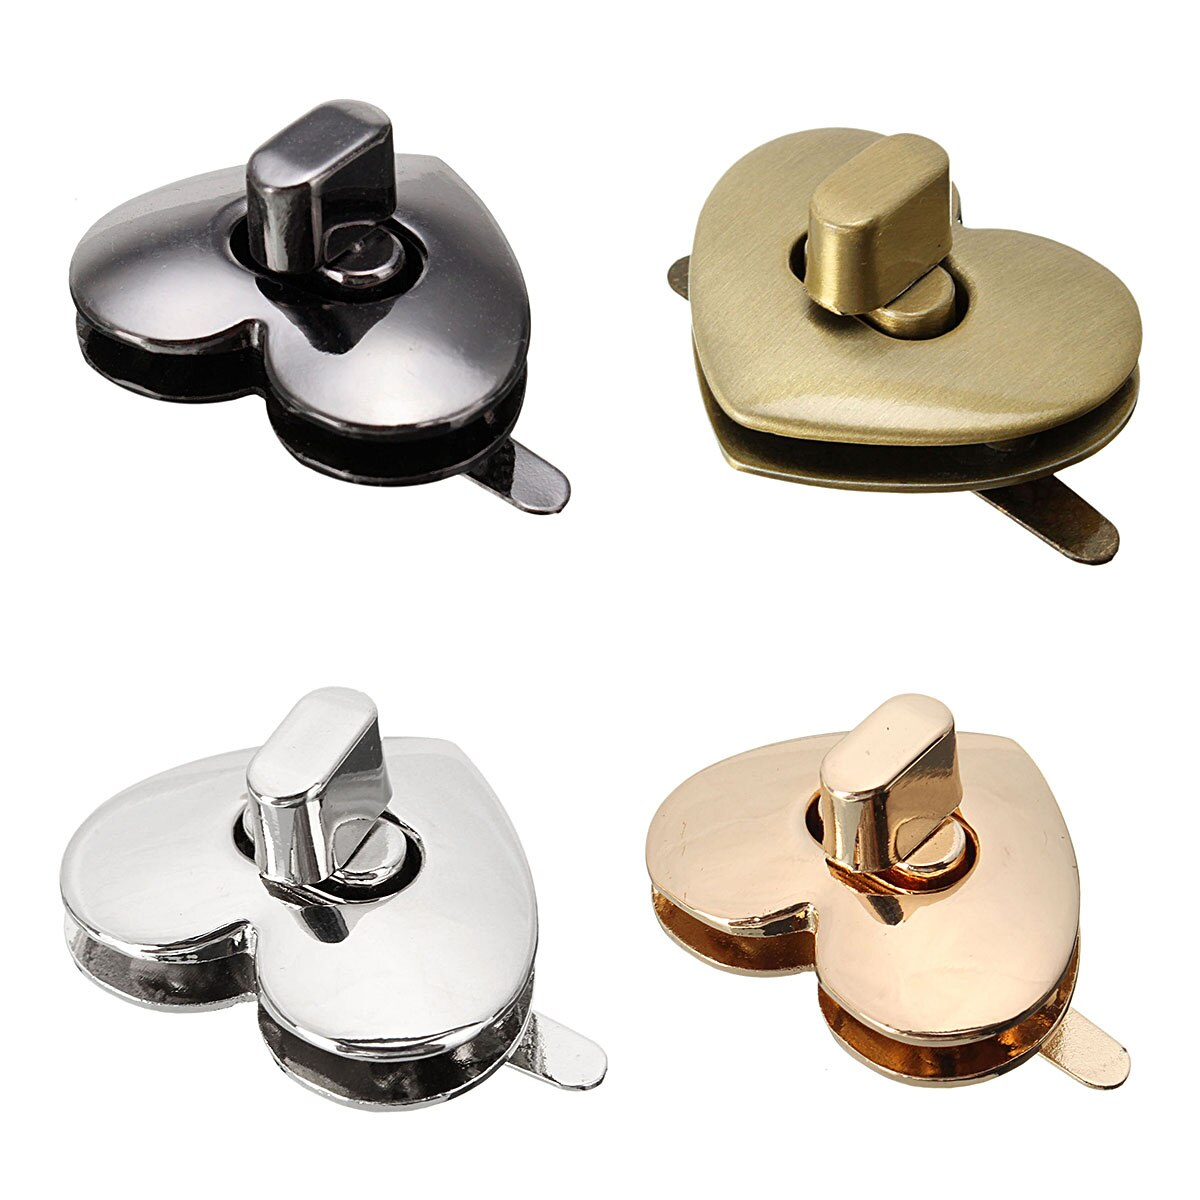 AEQUEEN 32mm X 28mm Cute Heart Shape Clasp Bronze Tone DIY Purse Snap Clasps Closure Lock Trunk Lock Replacement Bag Accessories